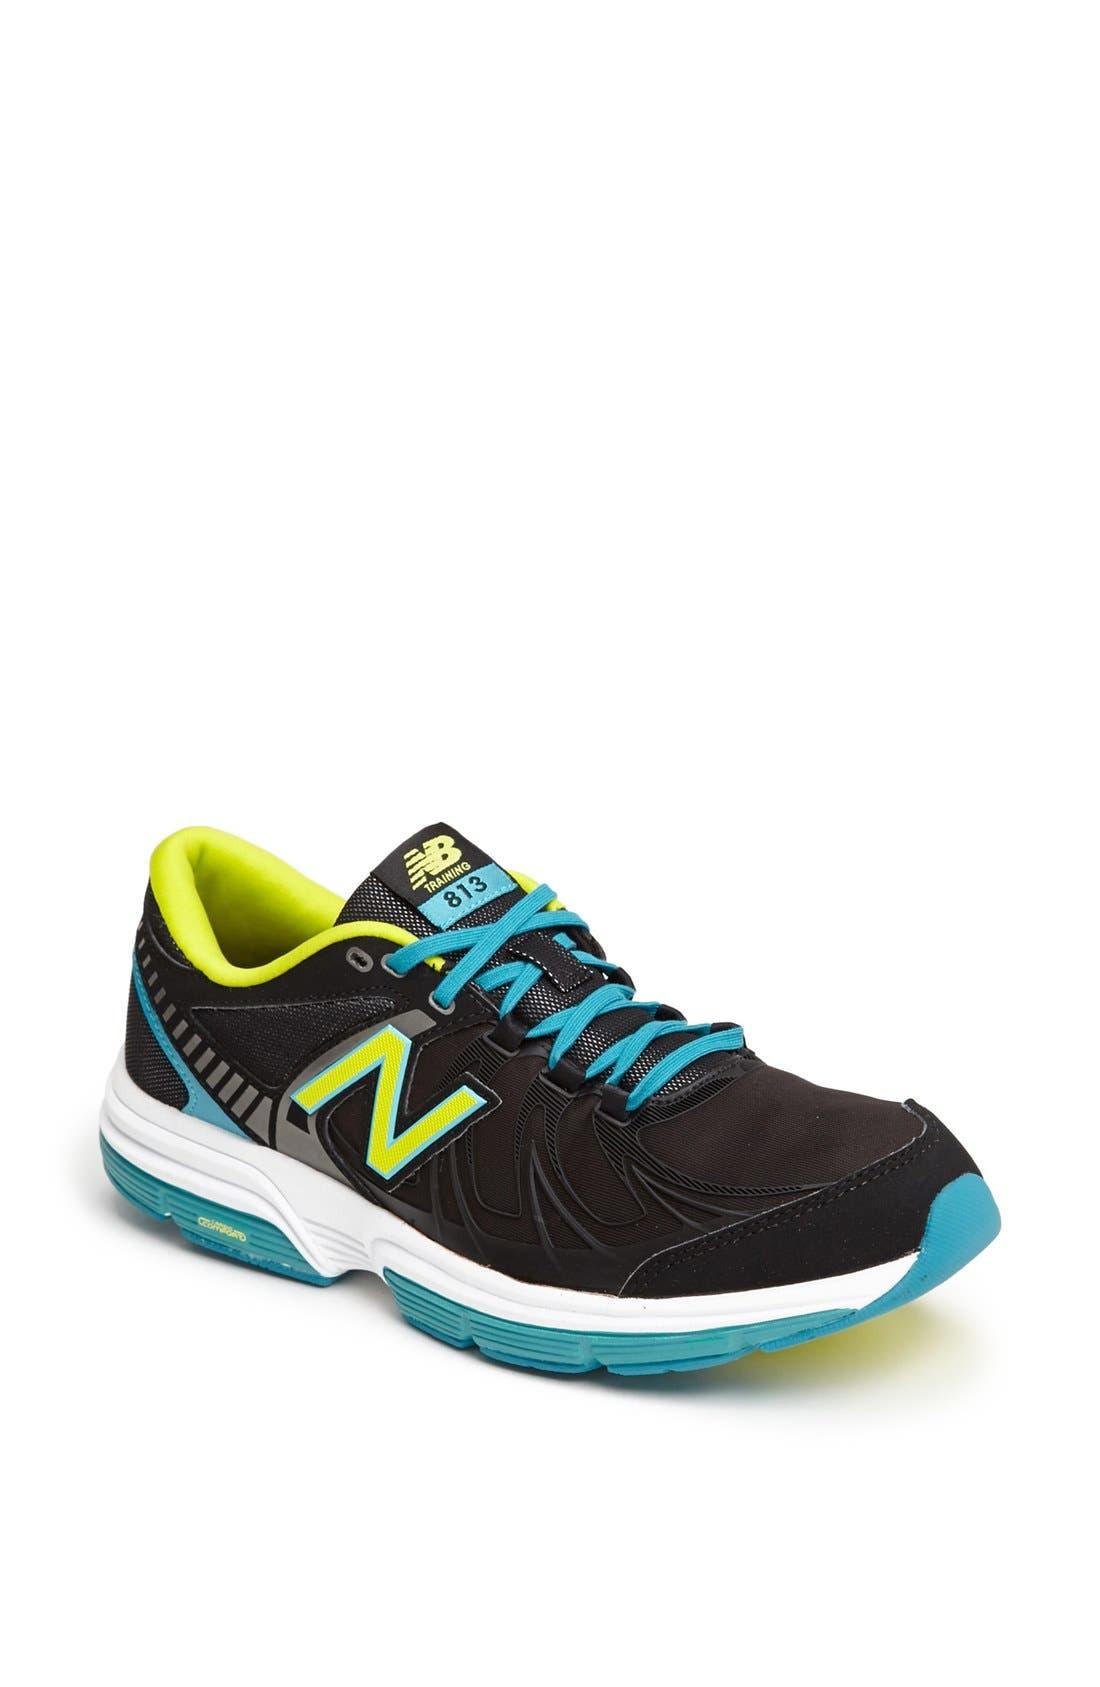 Main Image - New Balance '813' Training Shoe (Women)